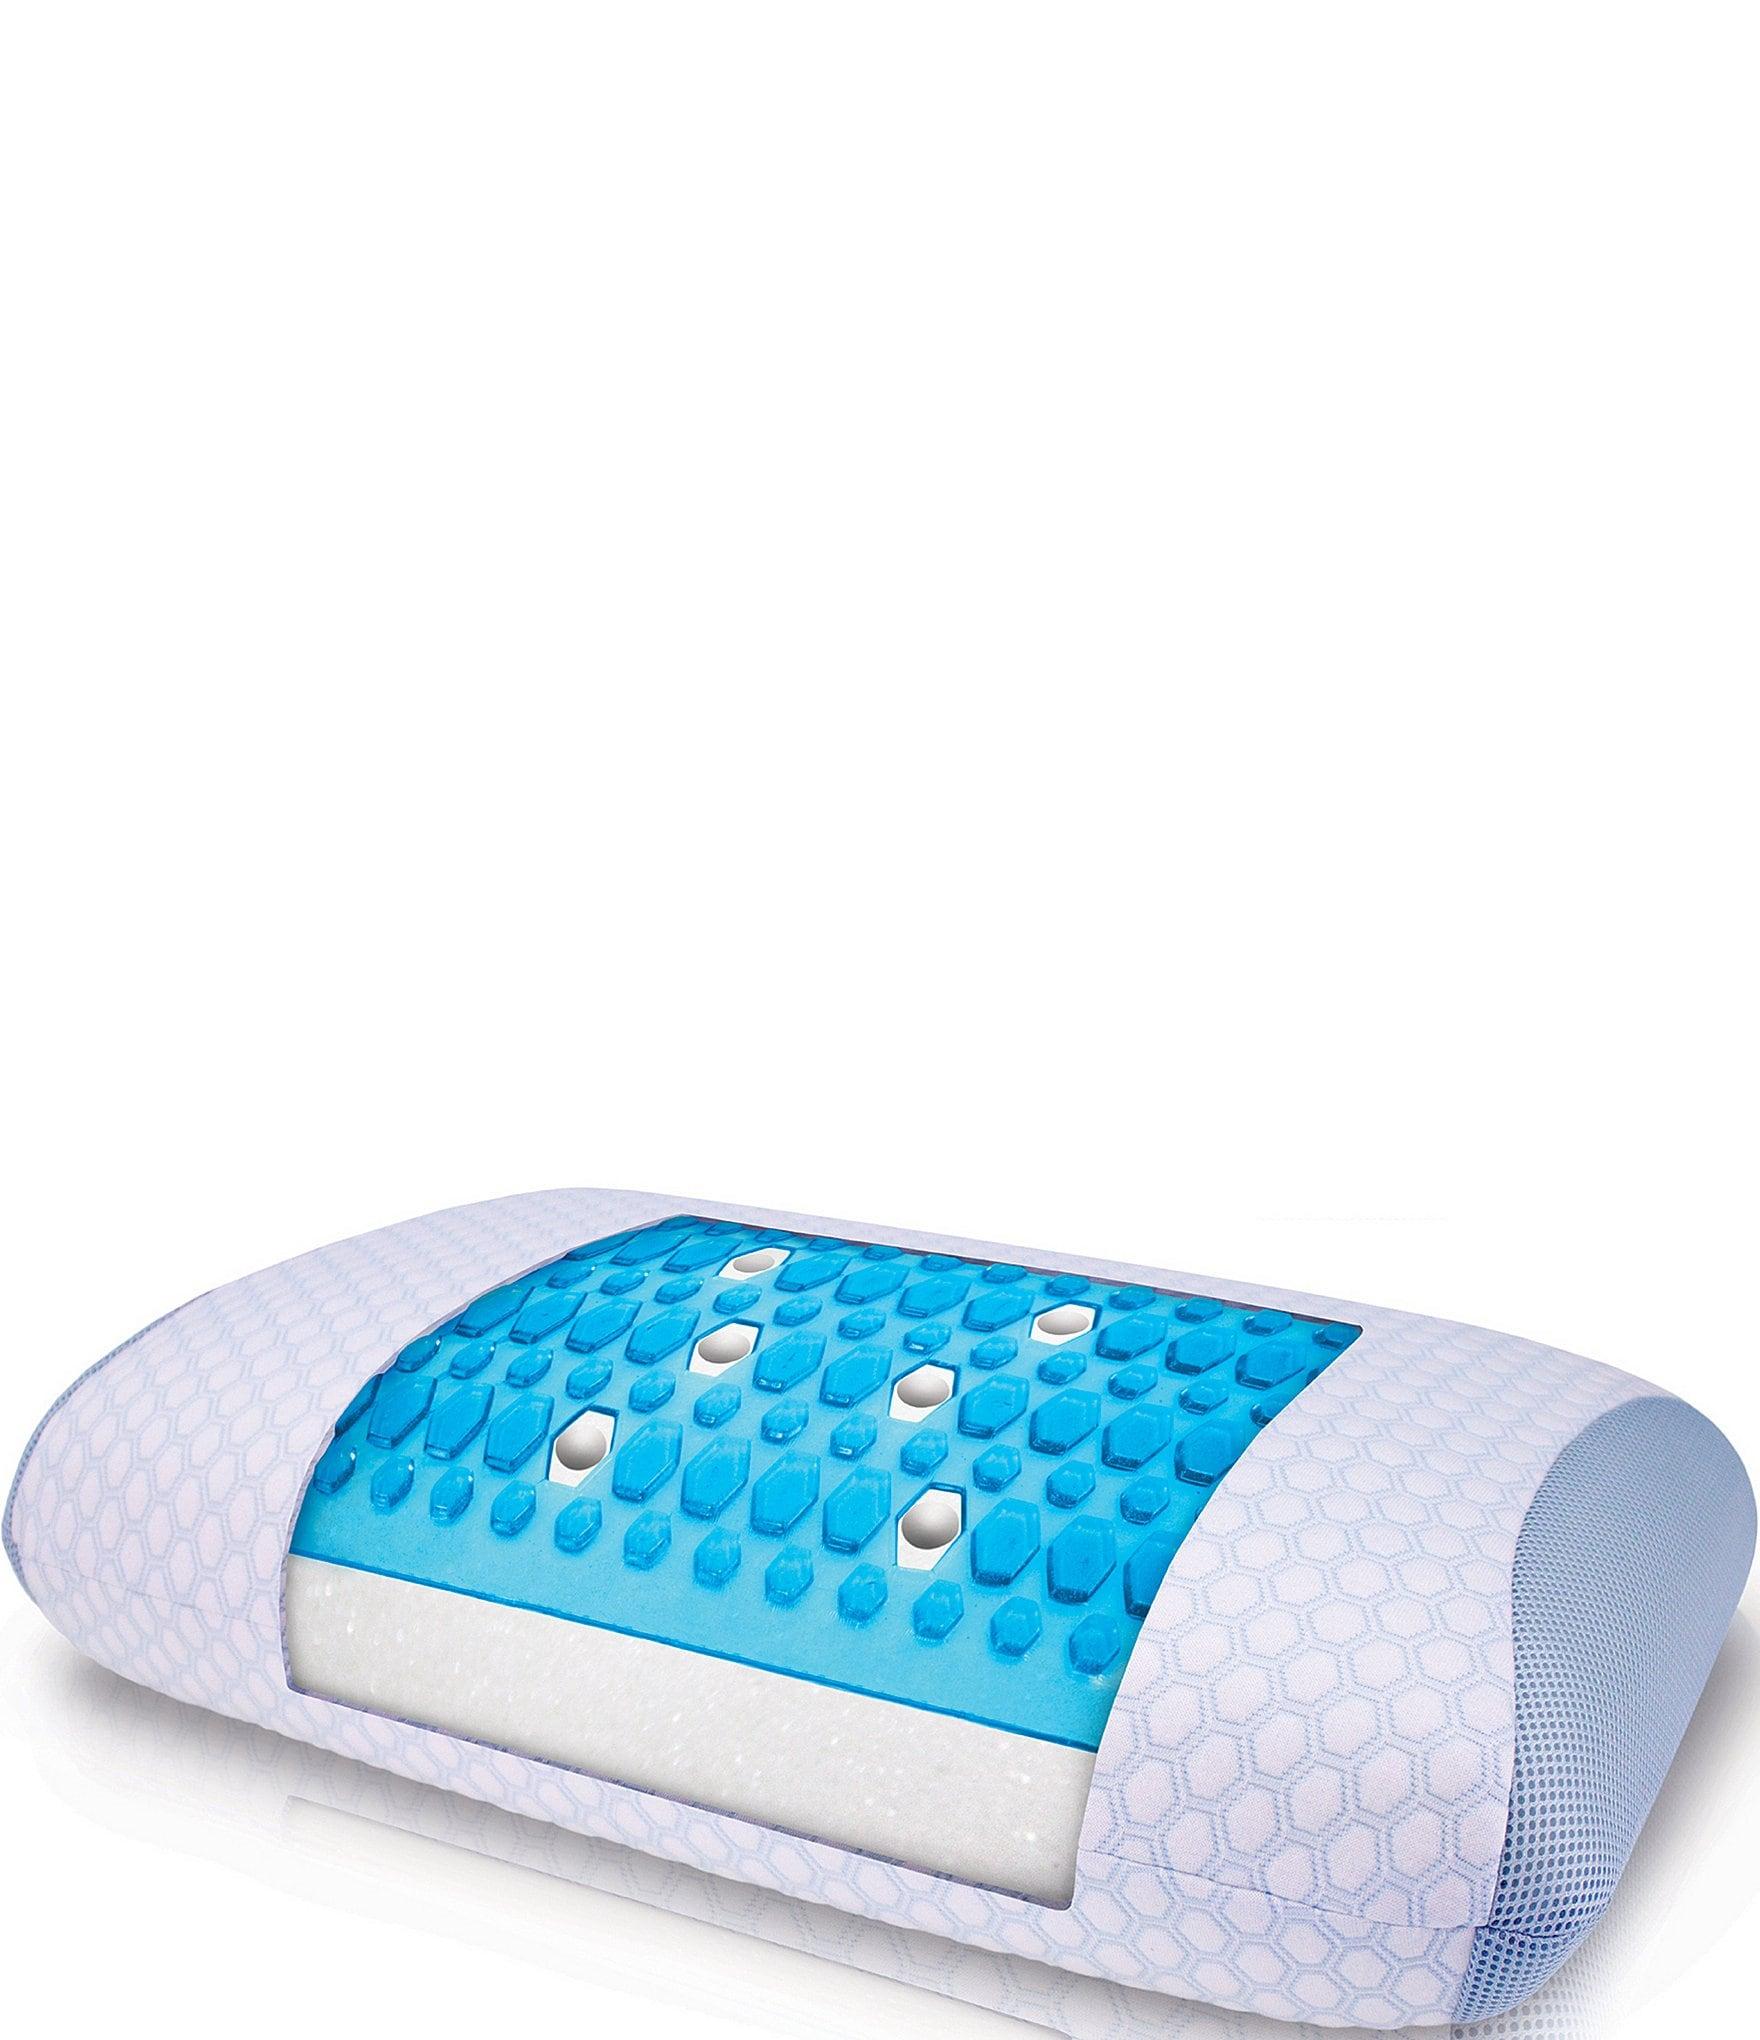 Sensorpedic Sensorcool Dual Sided Gusseted Memory Foam